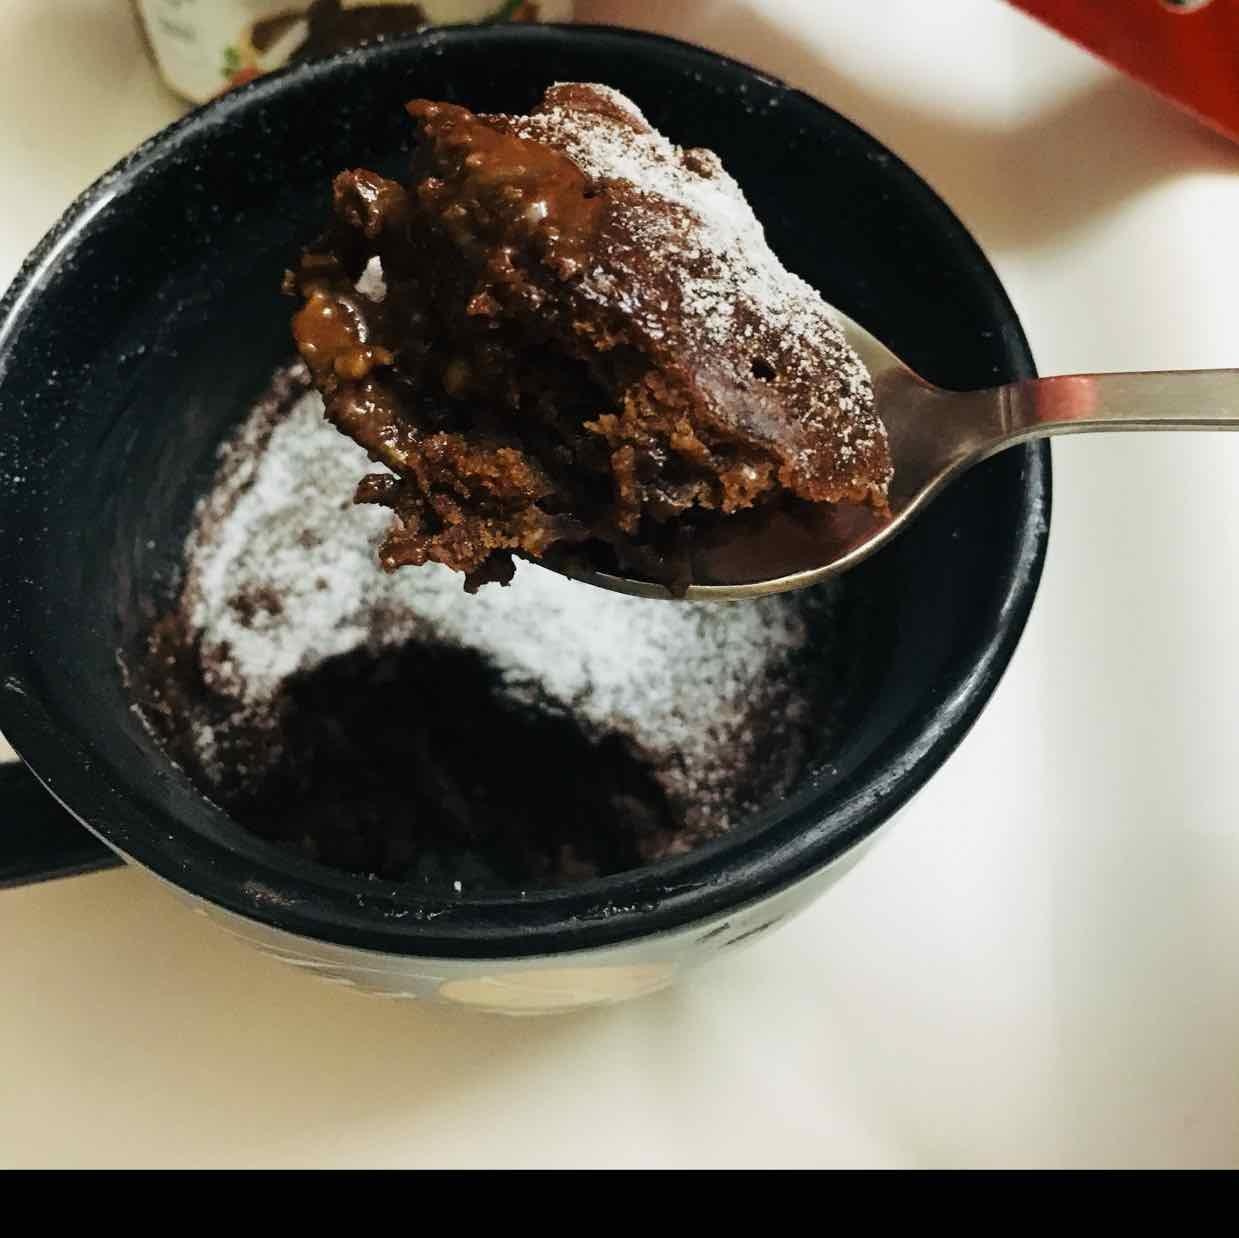 How to make Nutella mug cake